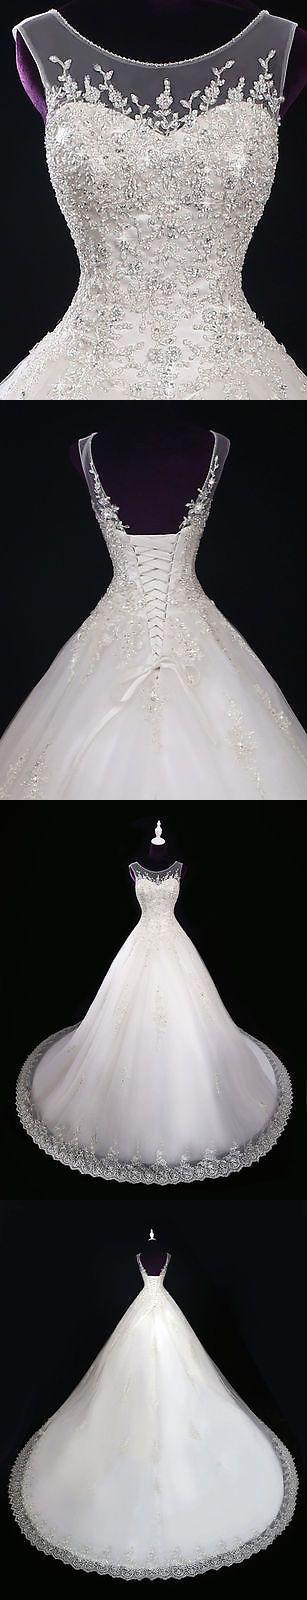 Ball Gown Wedding Dresses : Wedding Dresses: New Lace Ivory/White Wedding Dress Bridal Gown Custom Size 2 4